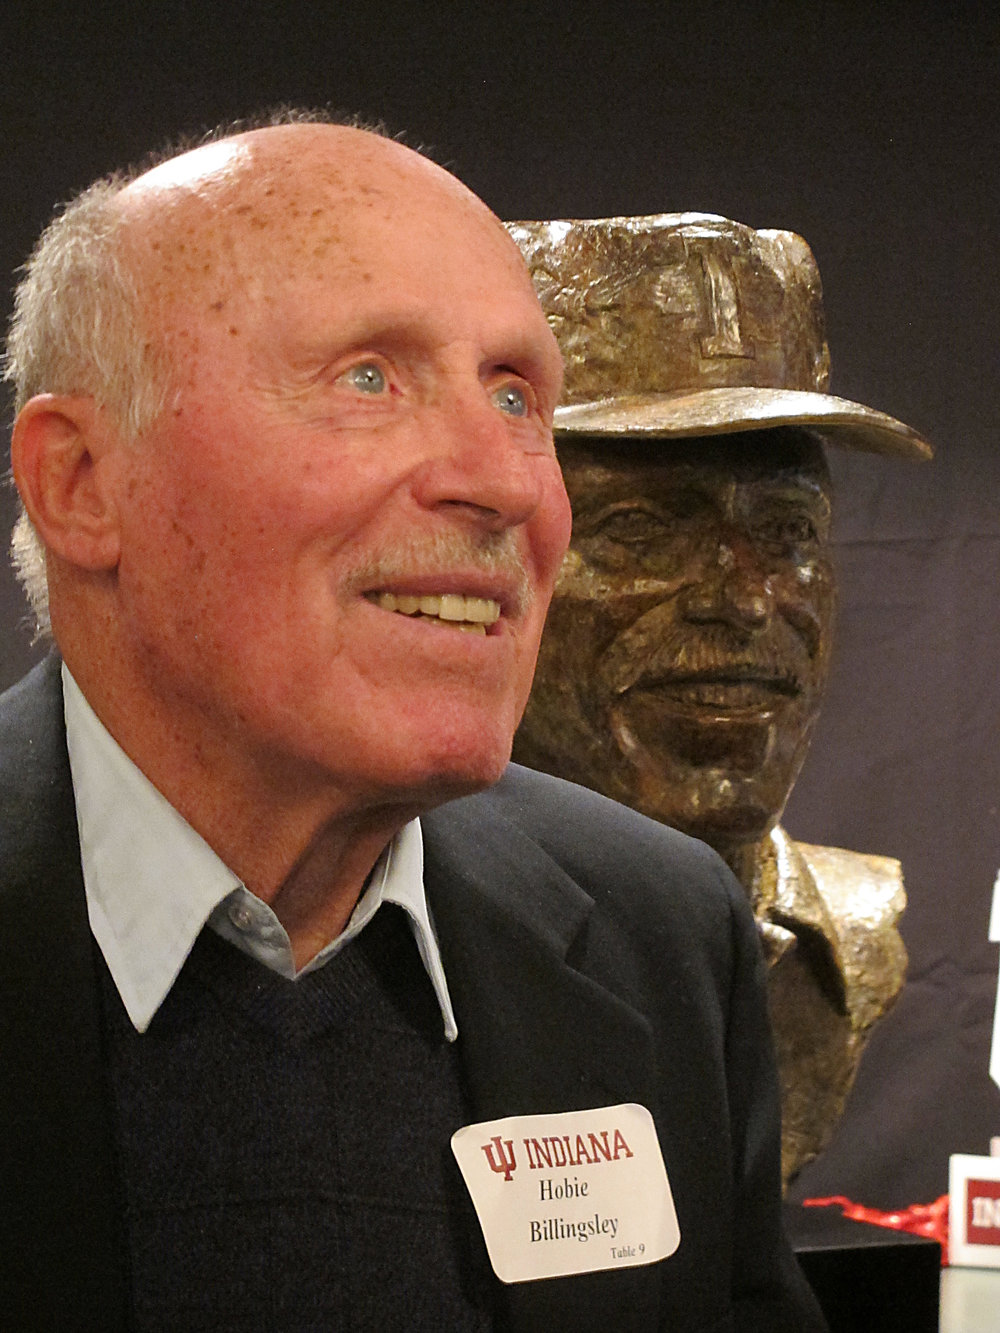 coach-hobie-billingsley-bronze-portrait-bust-01.jpg